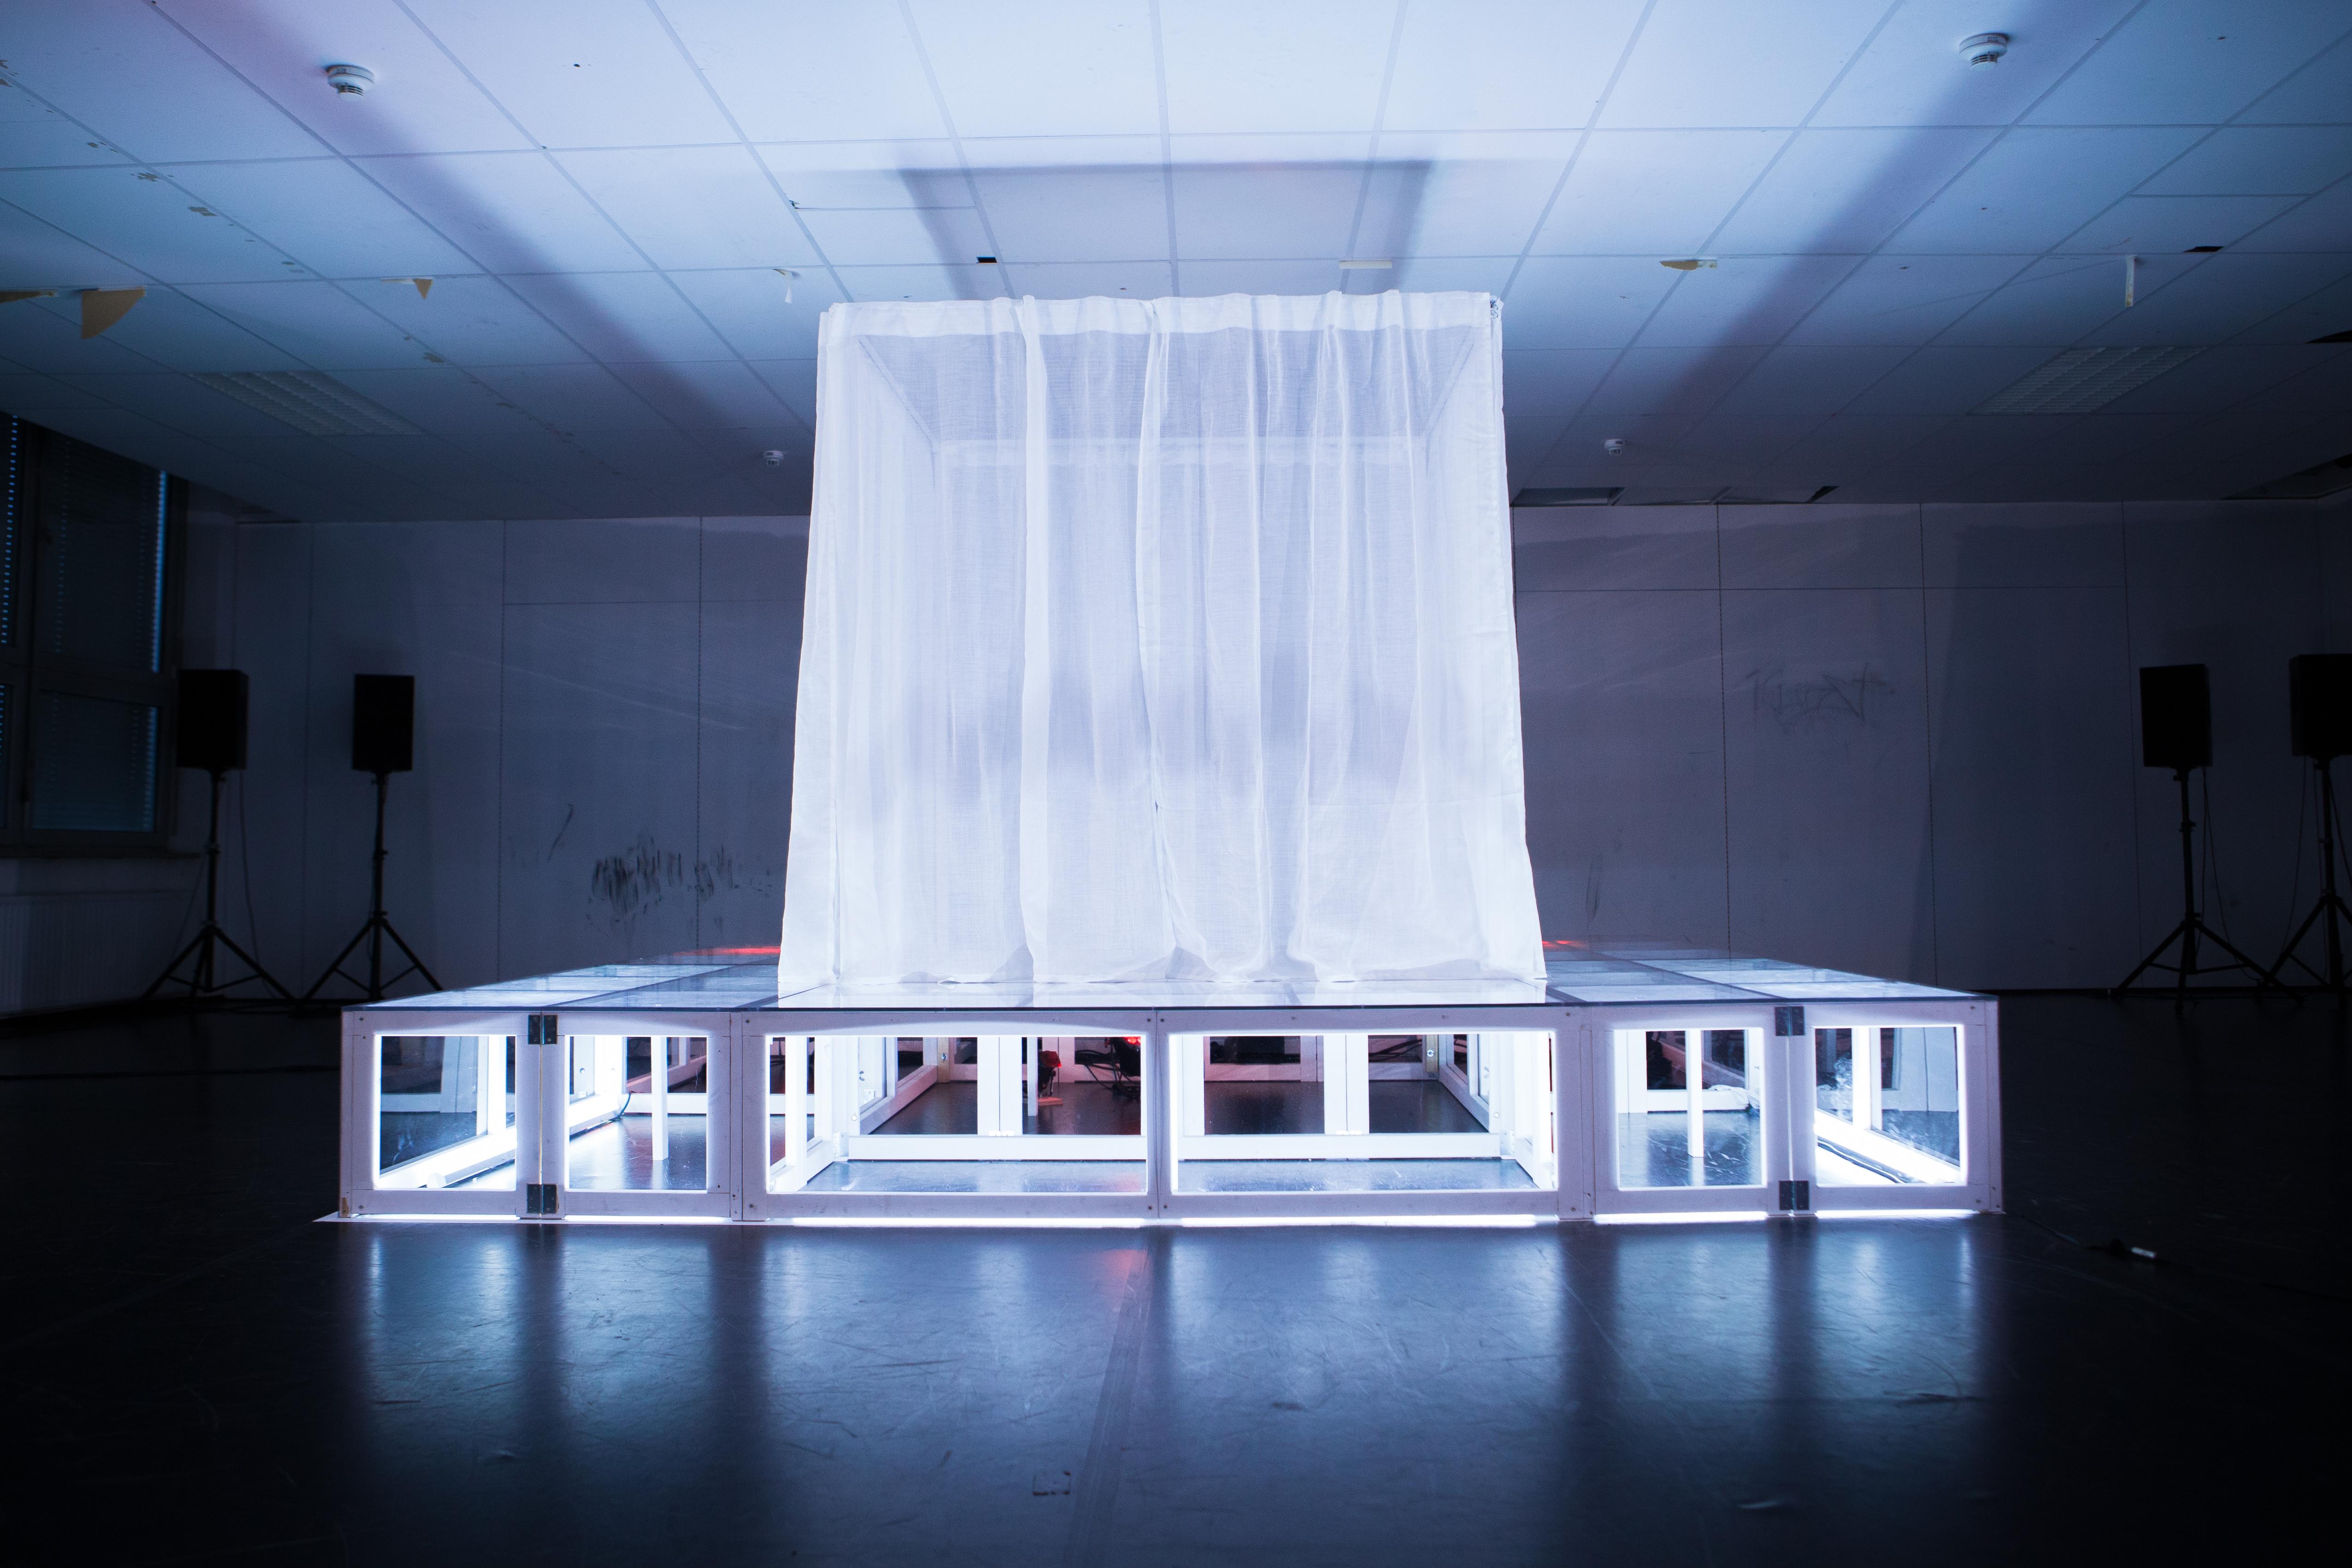 JOHANNA STENZEL Theater